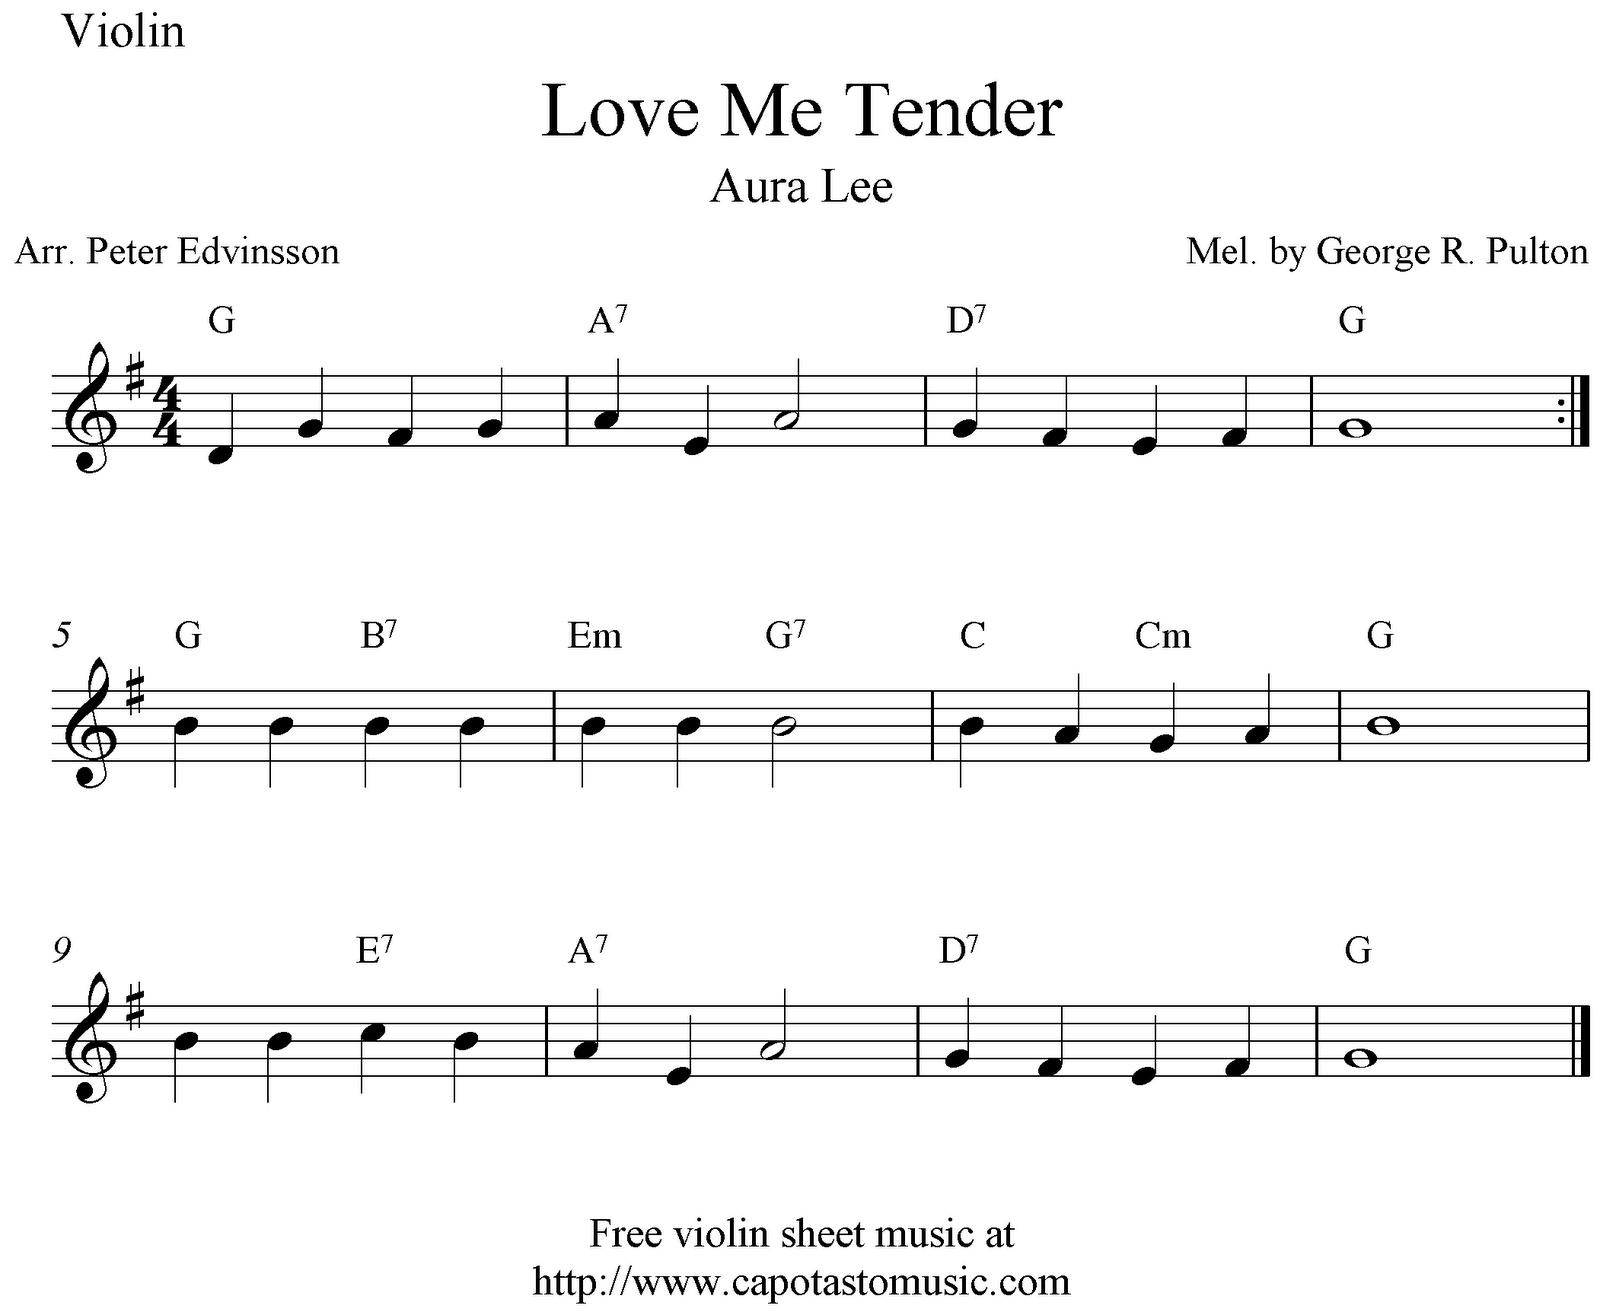 Love Me Tender Aura Lee Free Violin Sheet Music Notes